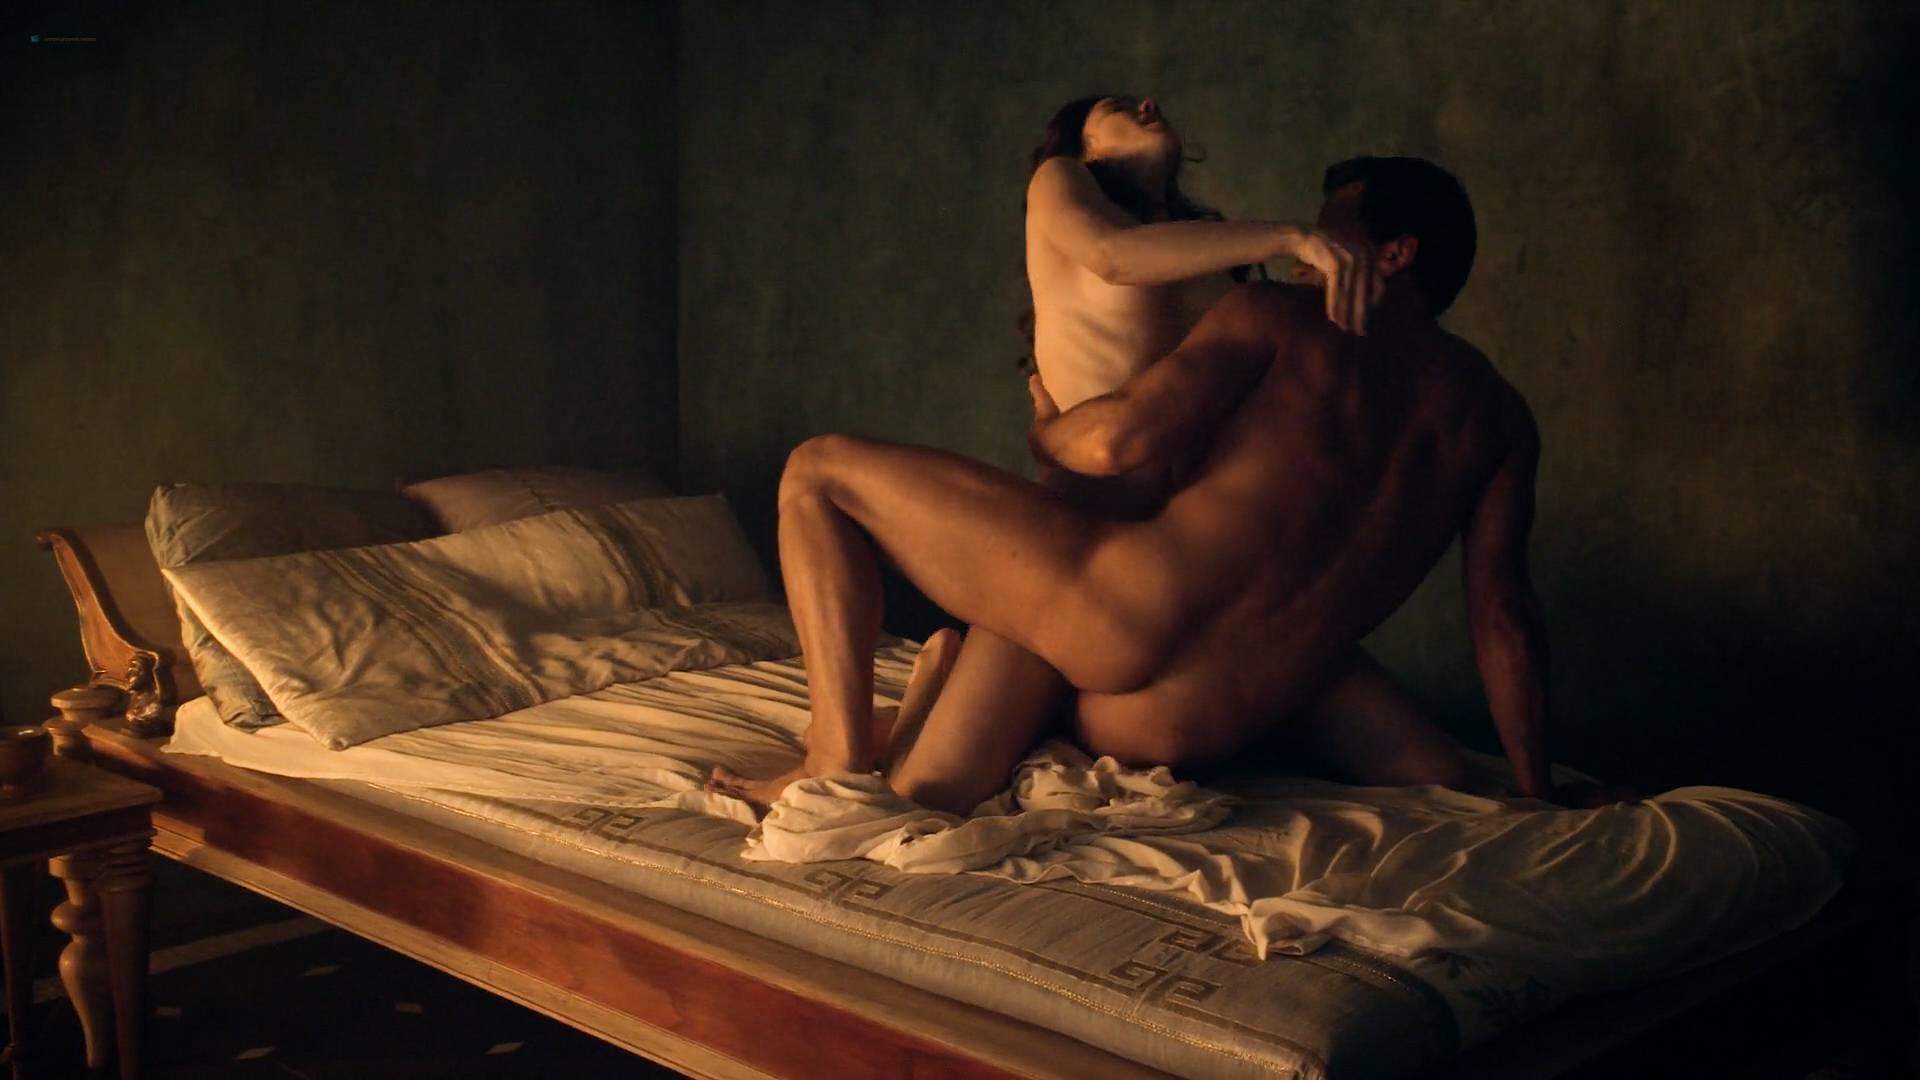 Evgeny Mishin  Free Porn Sex Tube Videos XXX Pics